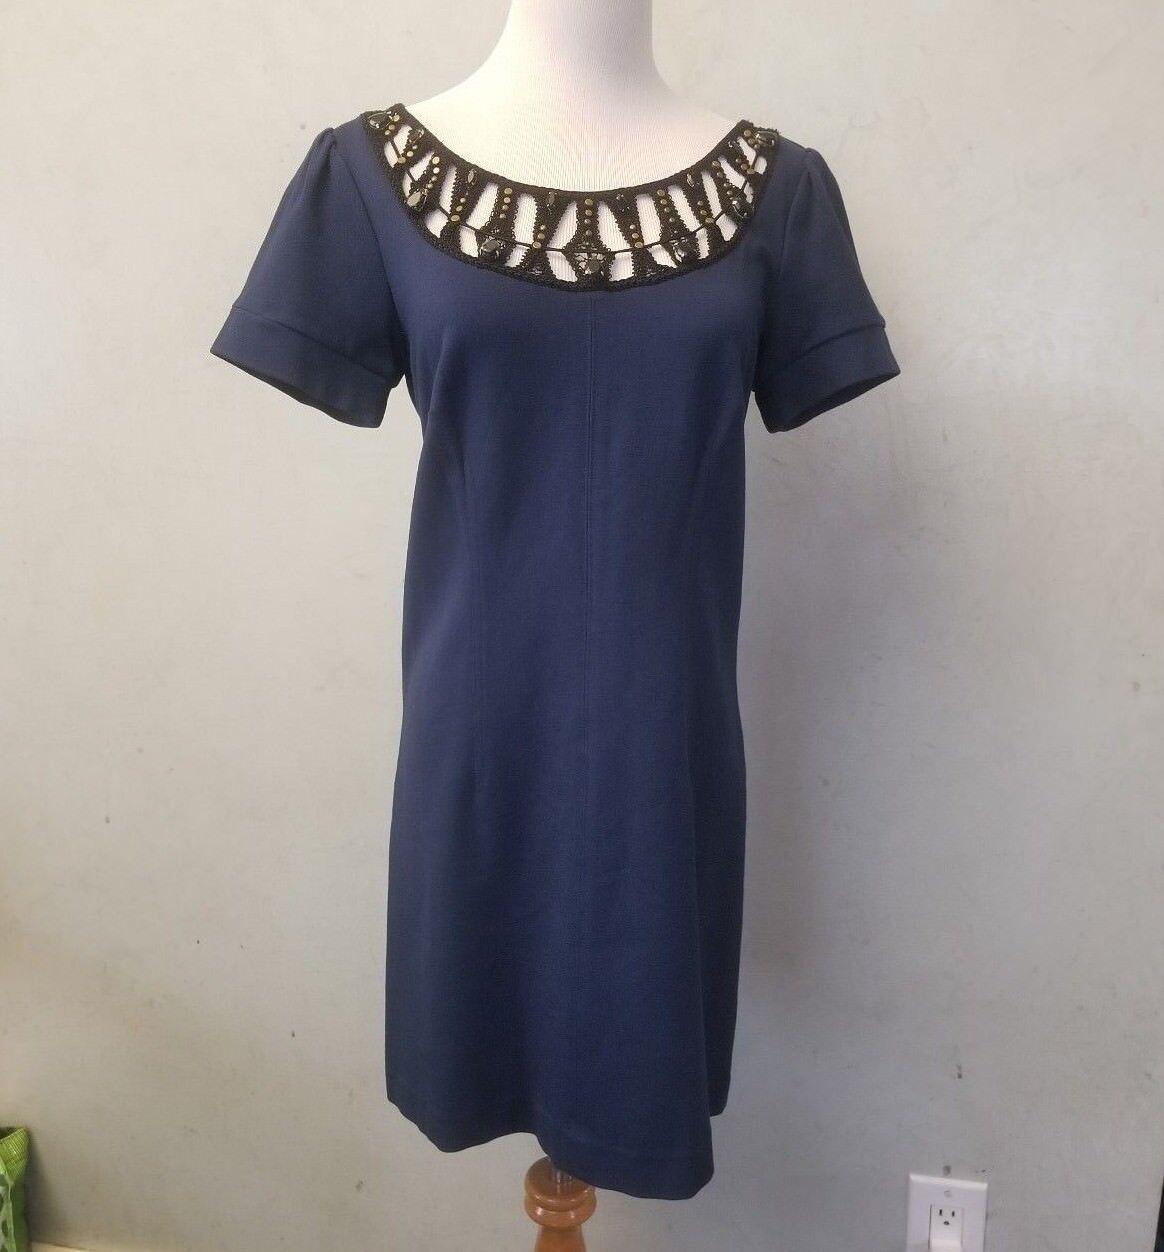 259 Laundry Shelli Segal short sleeve beaded embroidery dress (B 92-8)